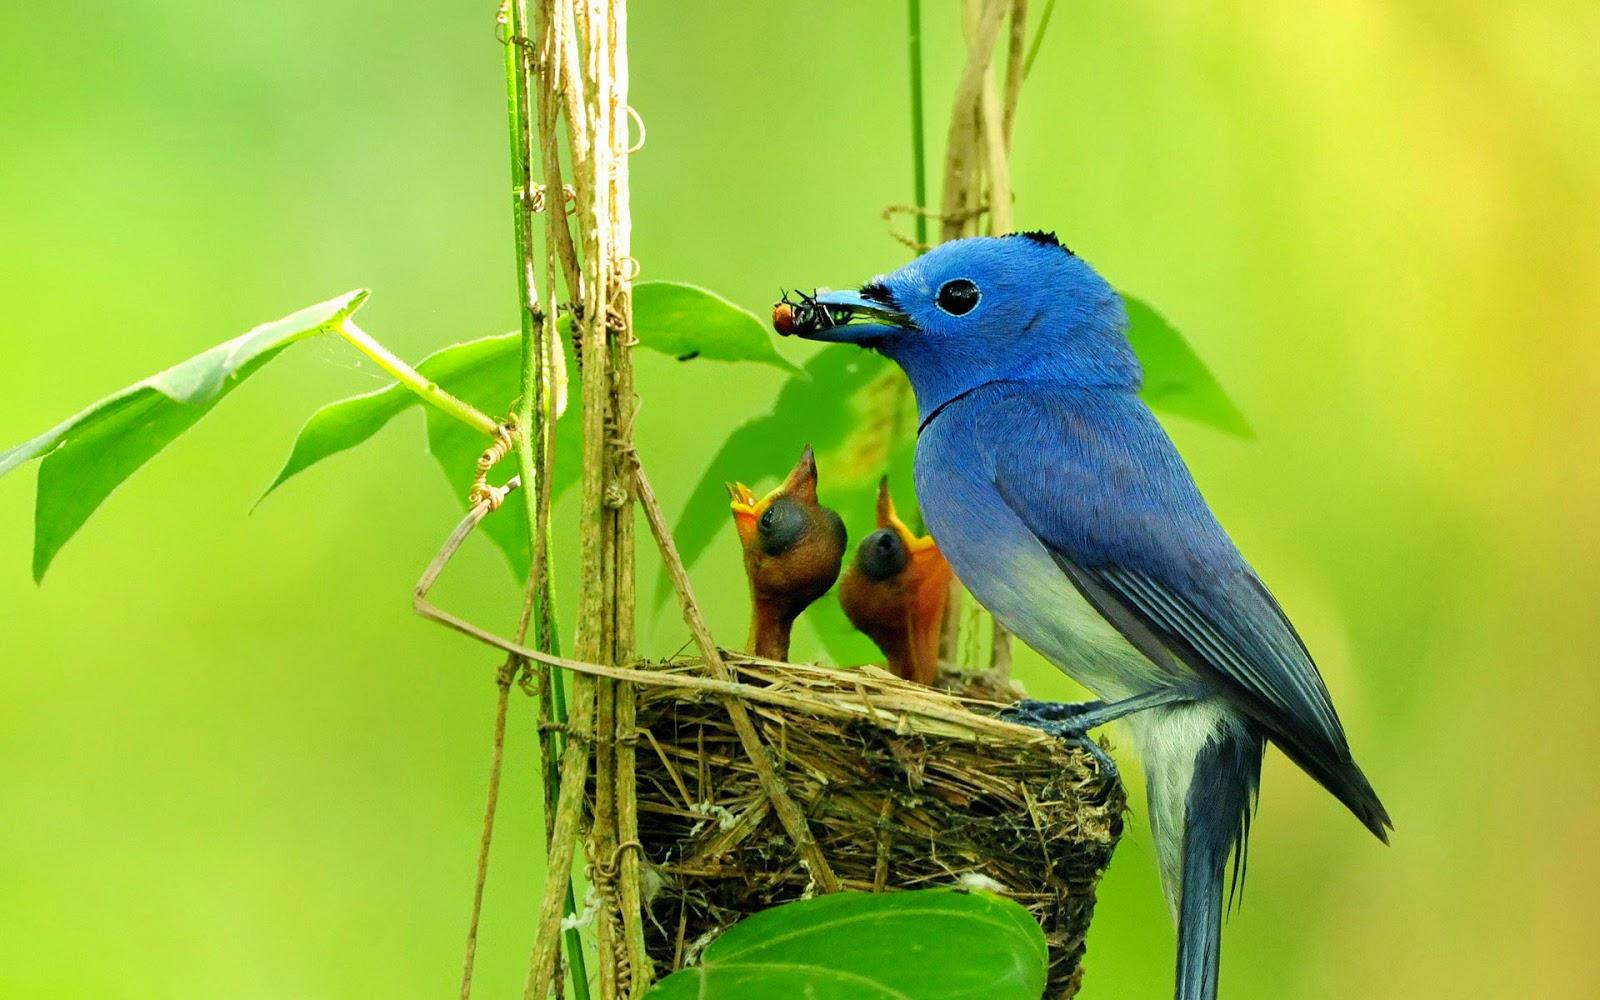 Cute Birds Hd Wallpaper Free Download: Pássaros: Passaros Coloridos (Colourful Birds